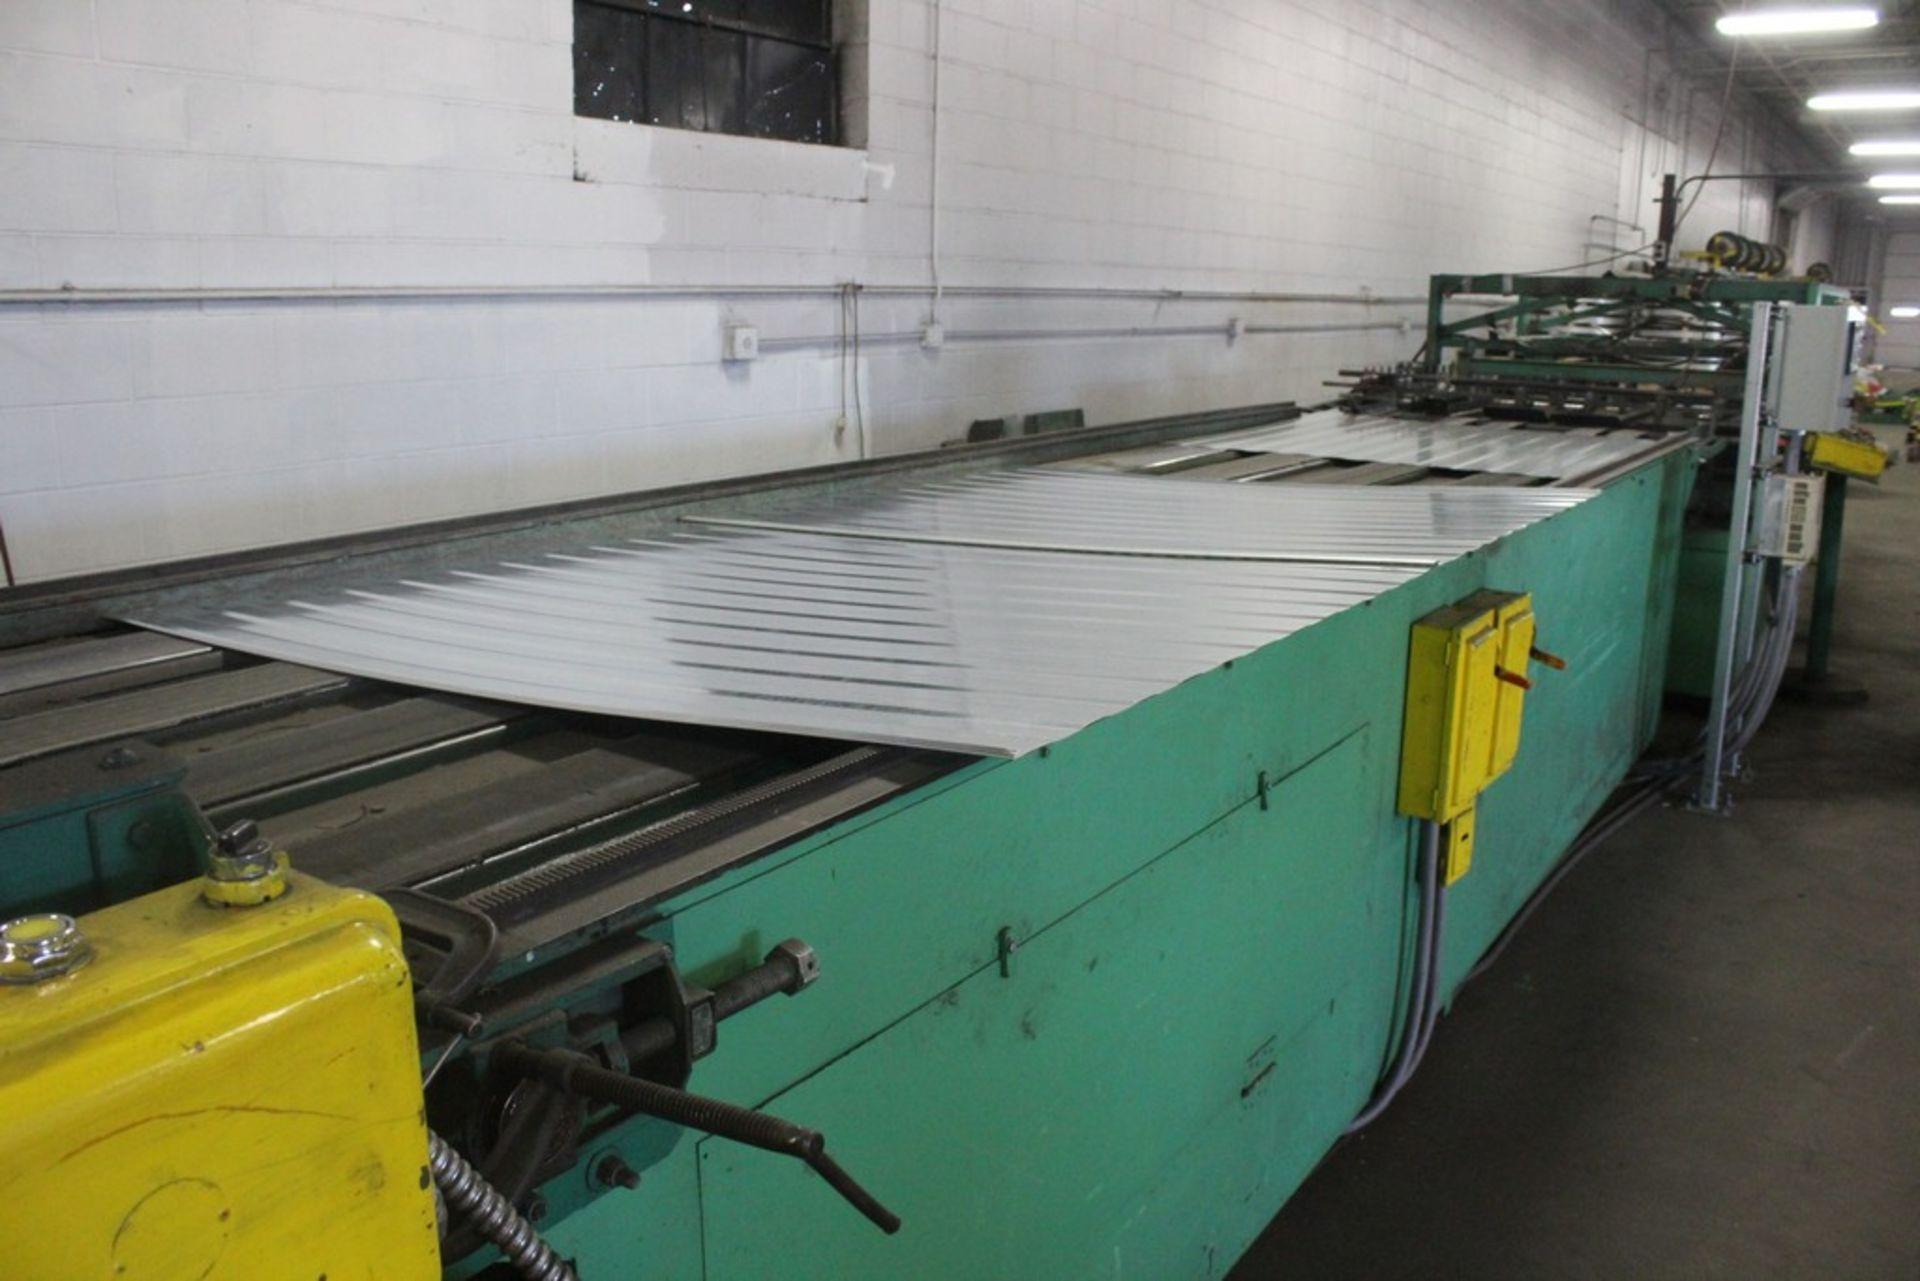 "Lot 48 - Riblet Products 48"" x 16 Ga Cut to Length Line Consisting of: 48"" x 16 ga Cut Off Shear - 2"" Mesa"